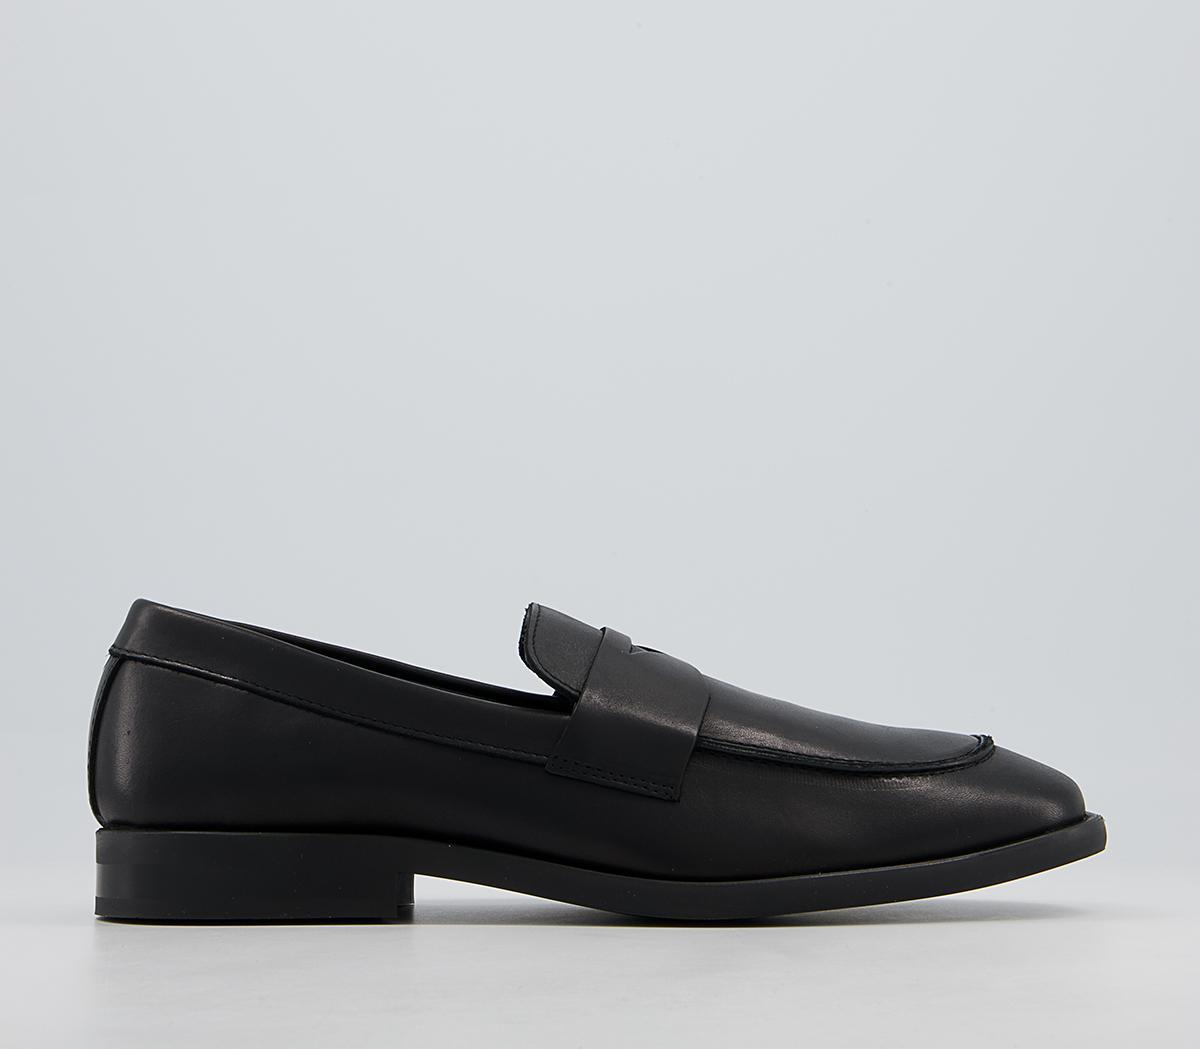 Marrakesh Square Toe Saddle Loafers